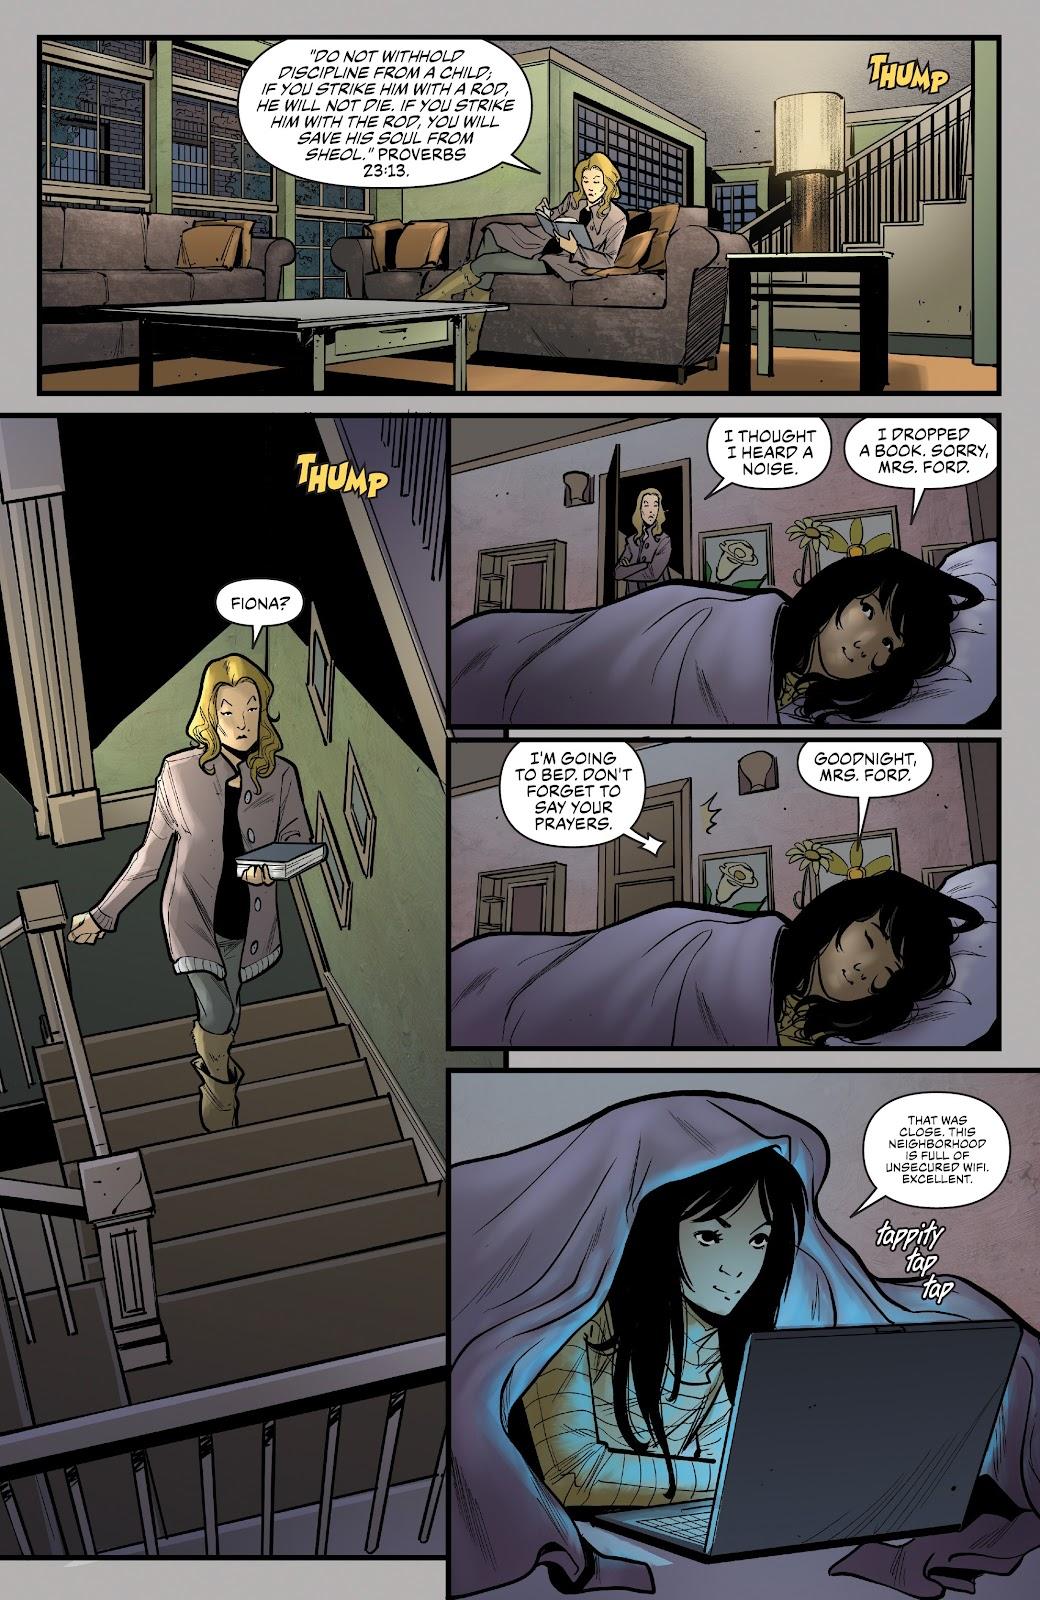 Read online Summit comic -  Issue #12 - 8